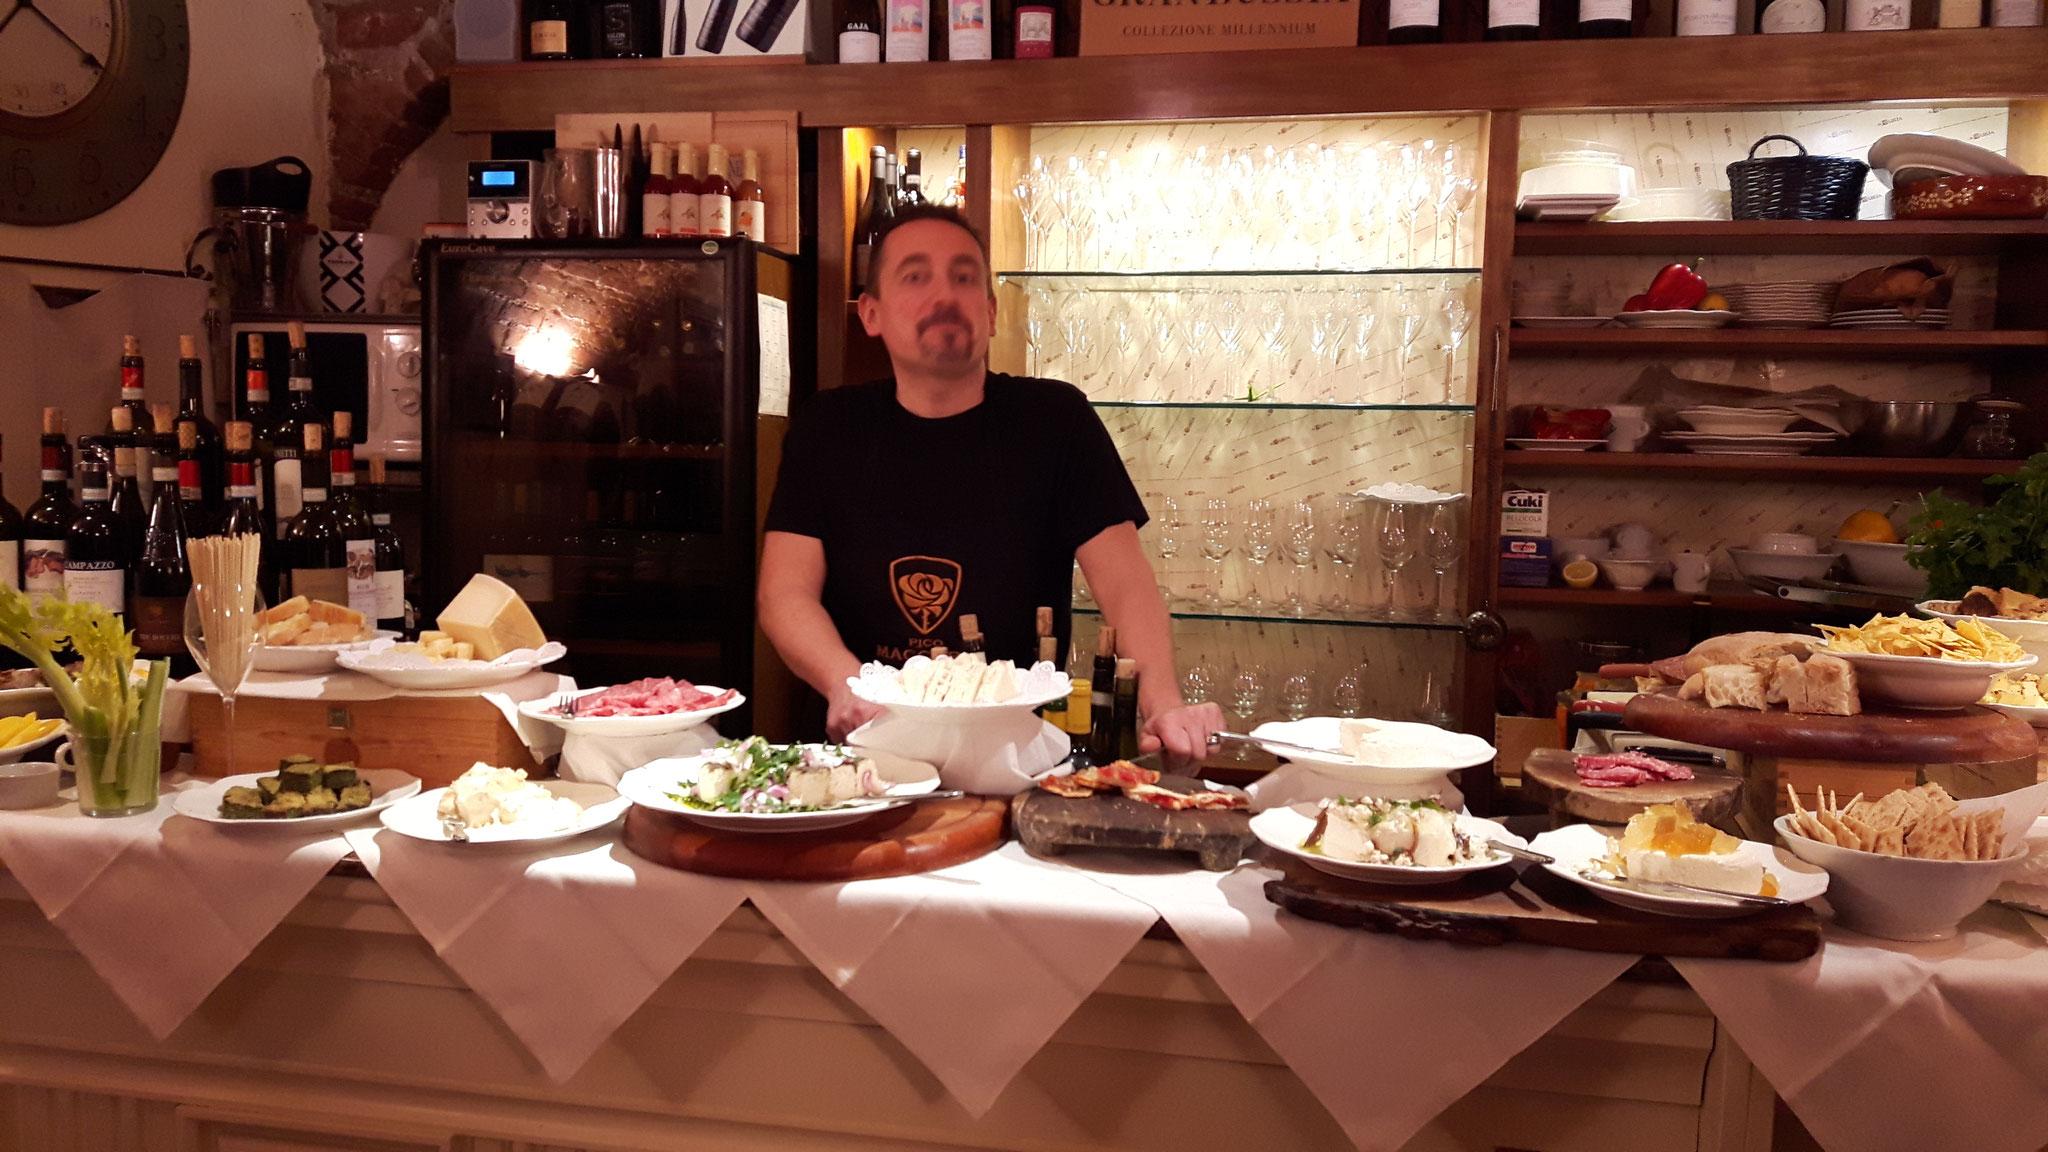 Eine Offenbarung. Das Aperobuffet in der Curia in Acqui Terme.